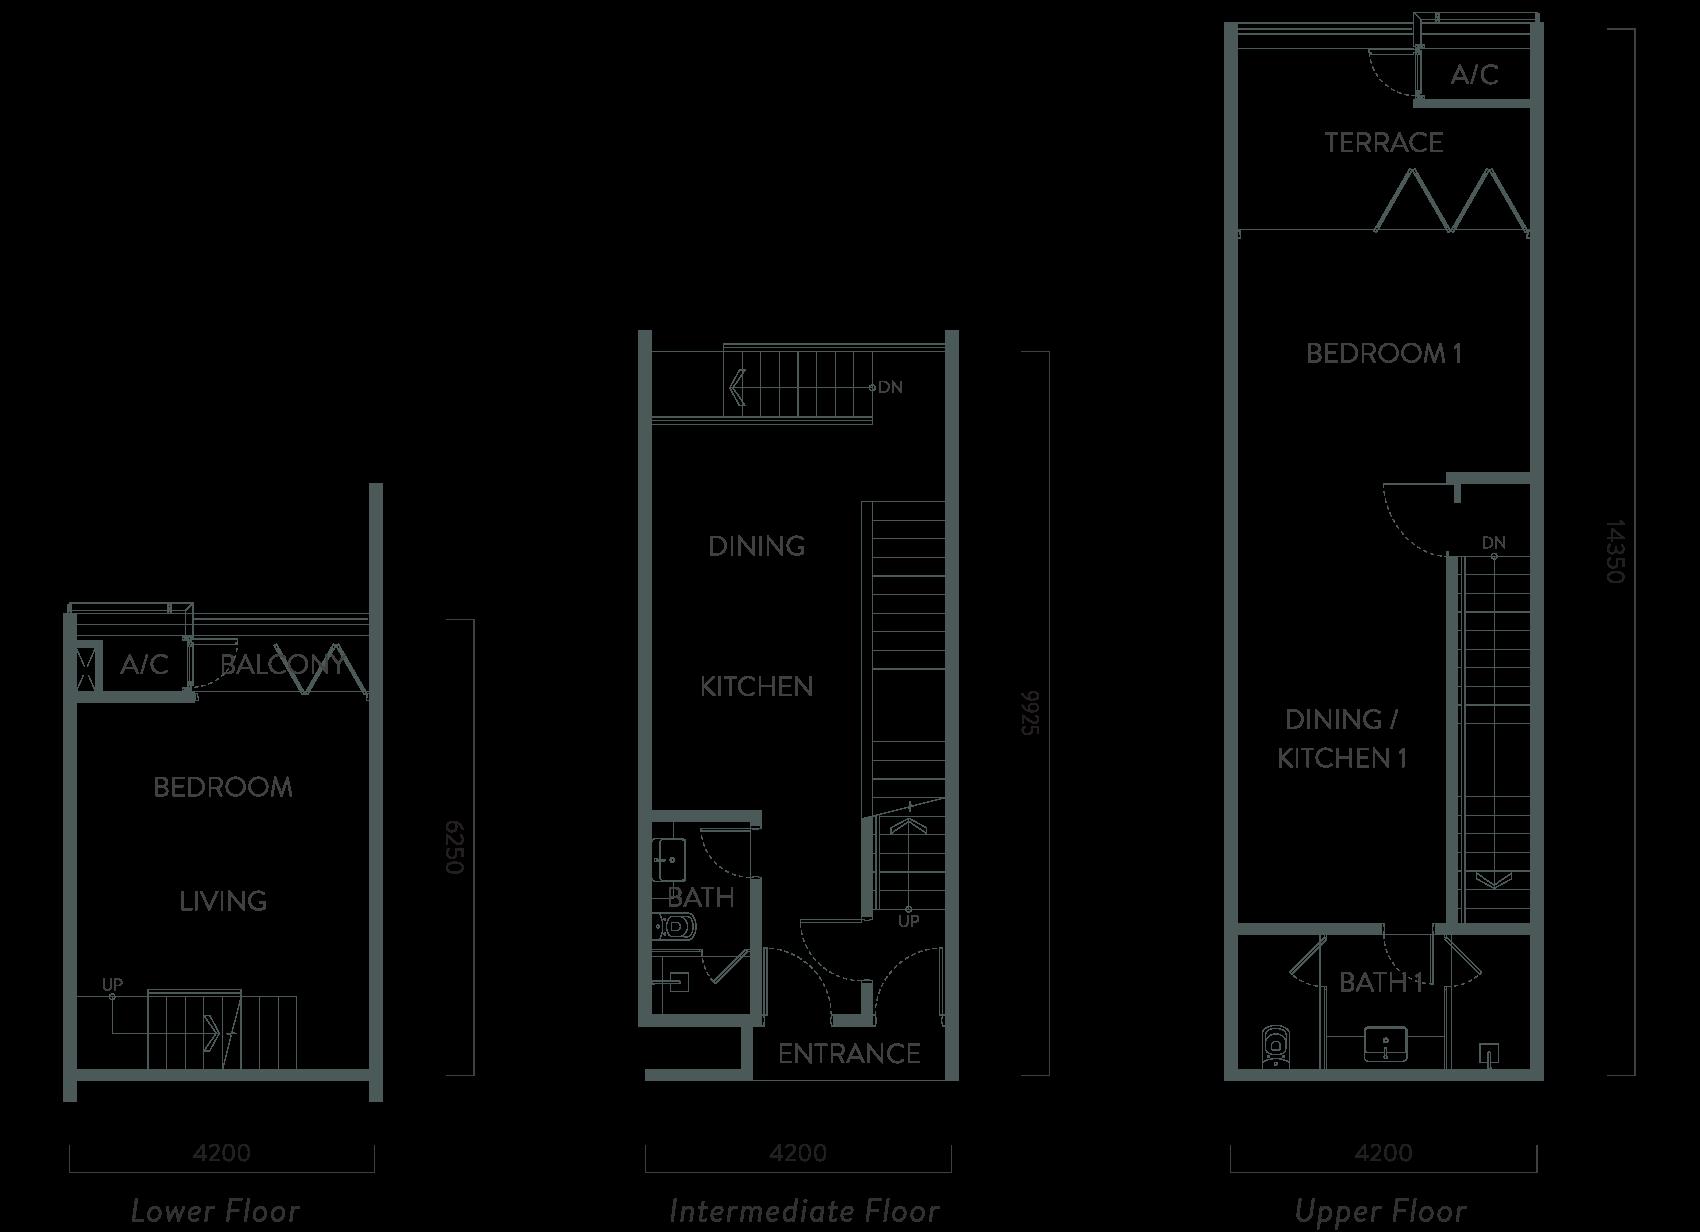 TS3b-m Floorplan